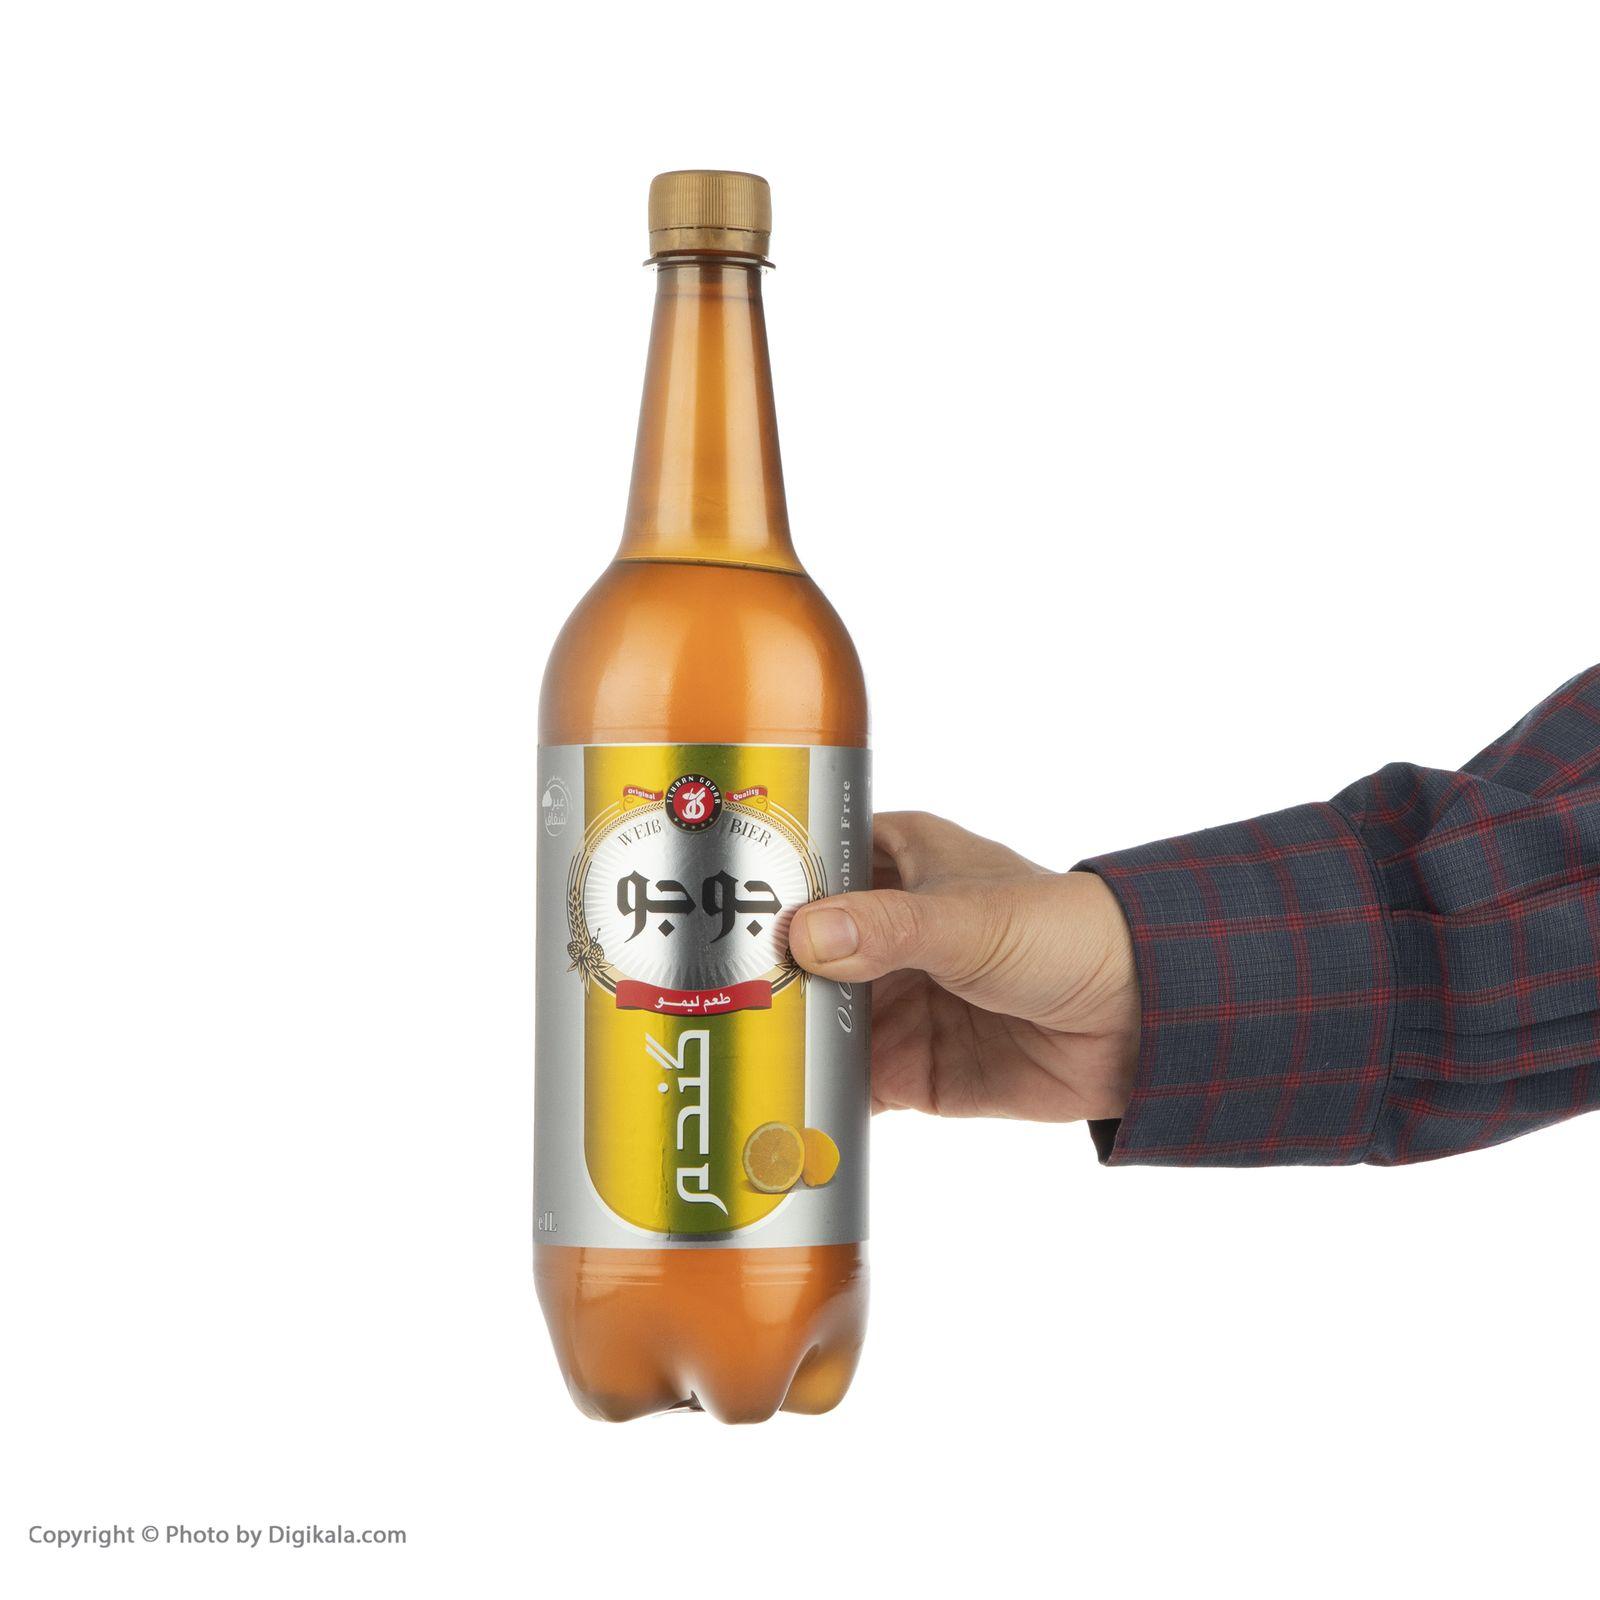 آب گندم جوجو با طعم لیمو - 1 لیتر بسته 6 عددی main 1 3